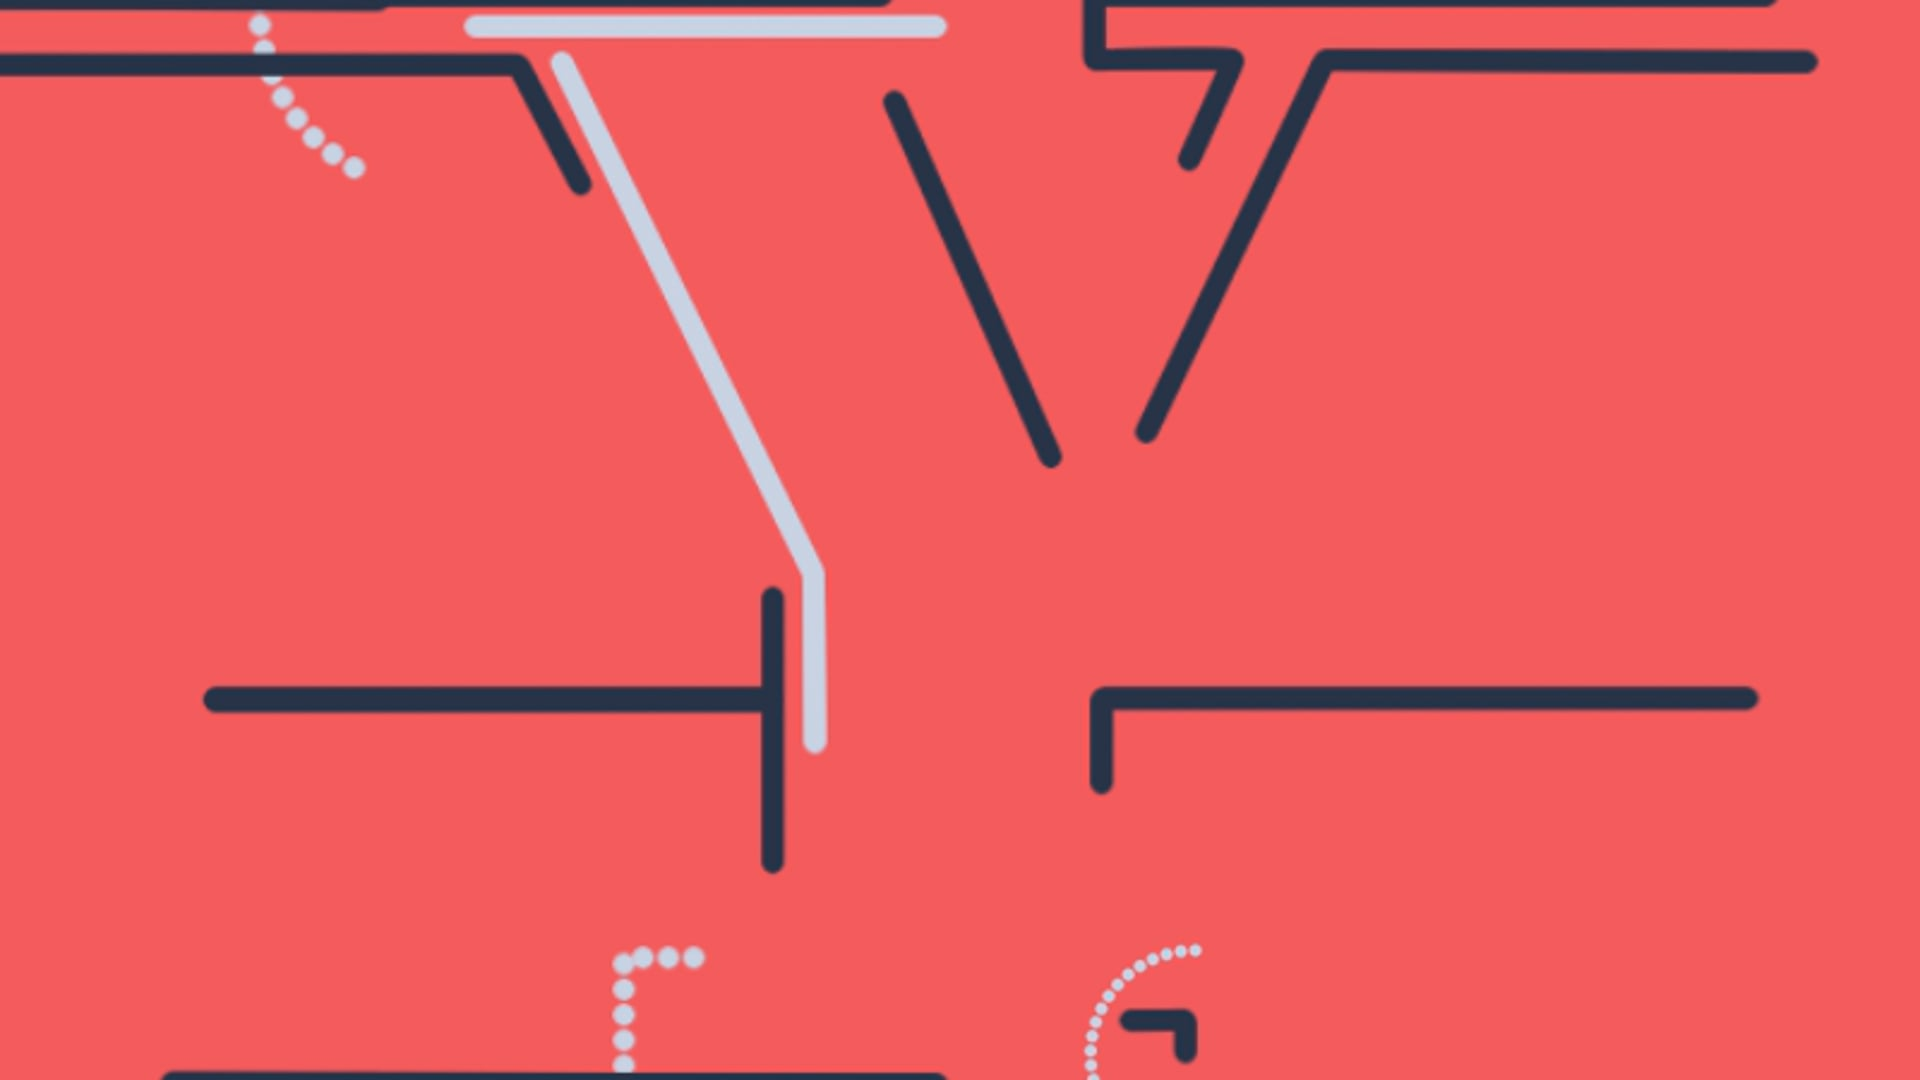 36 days of type - Y